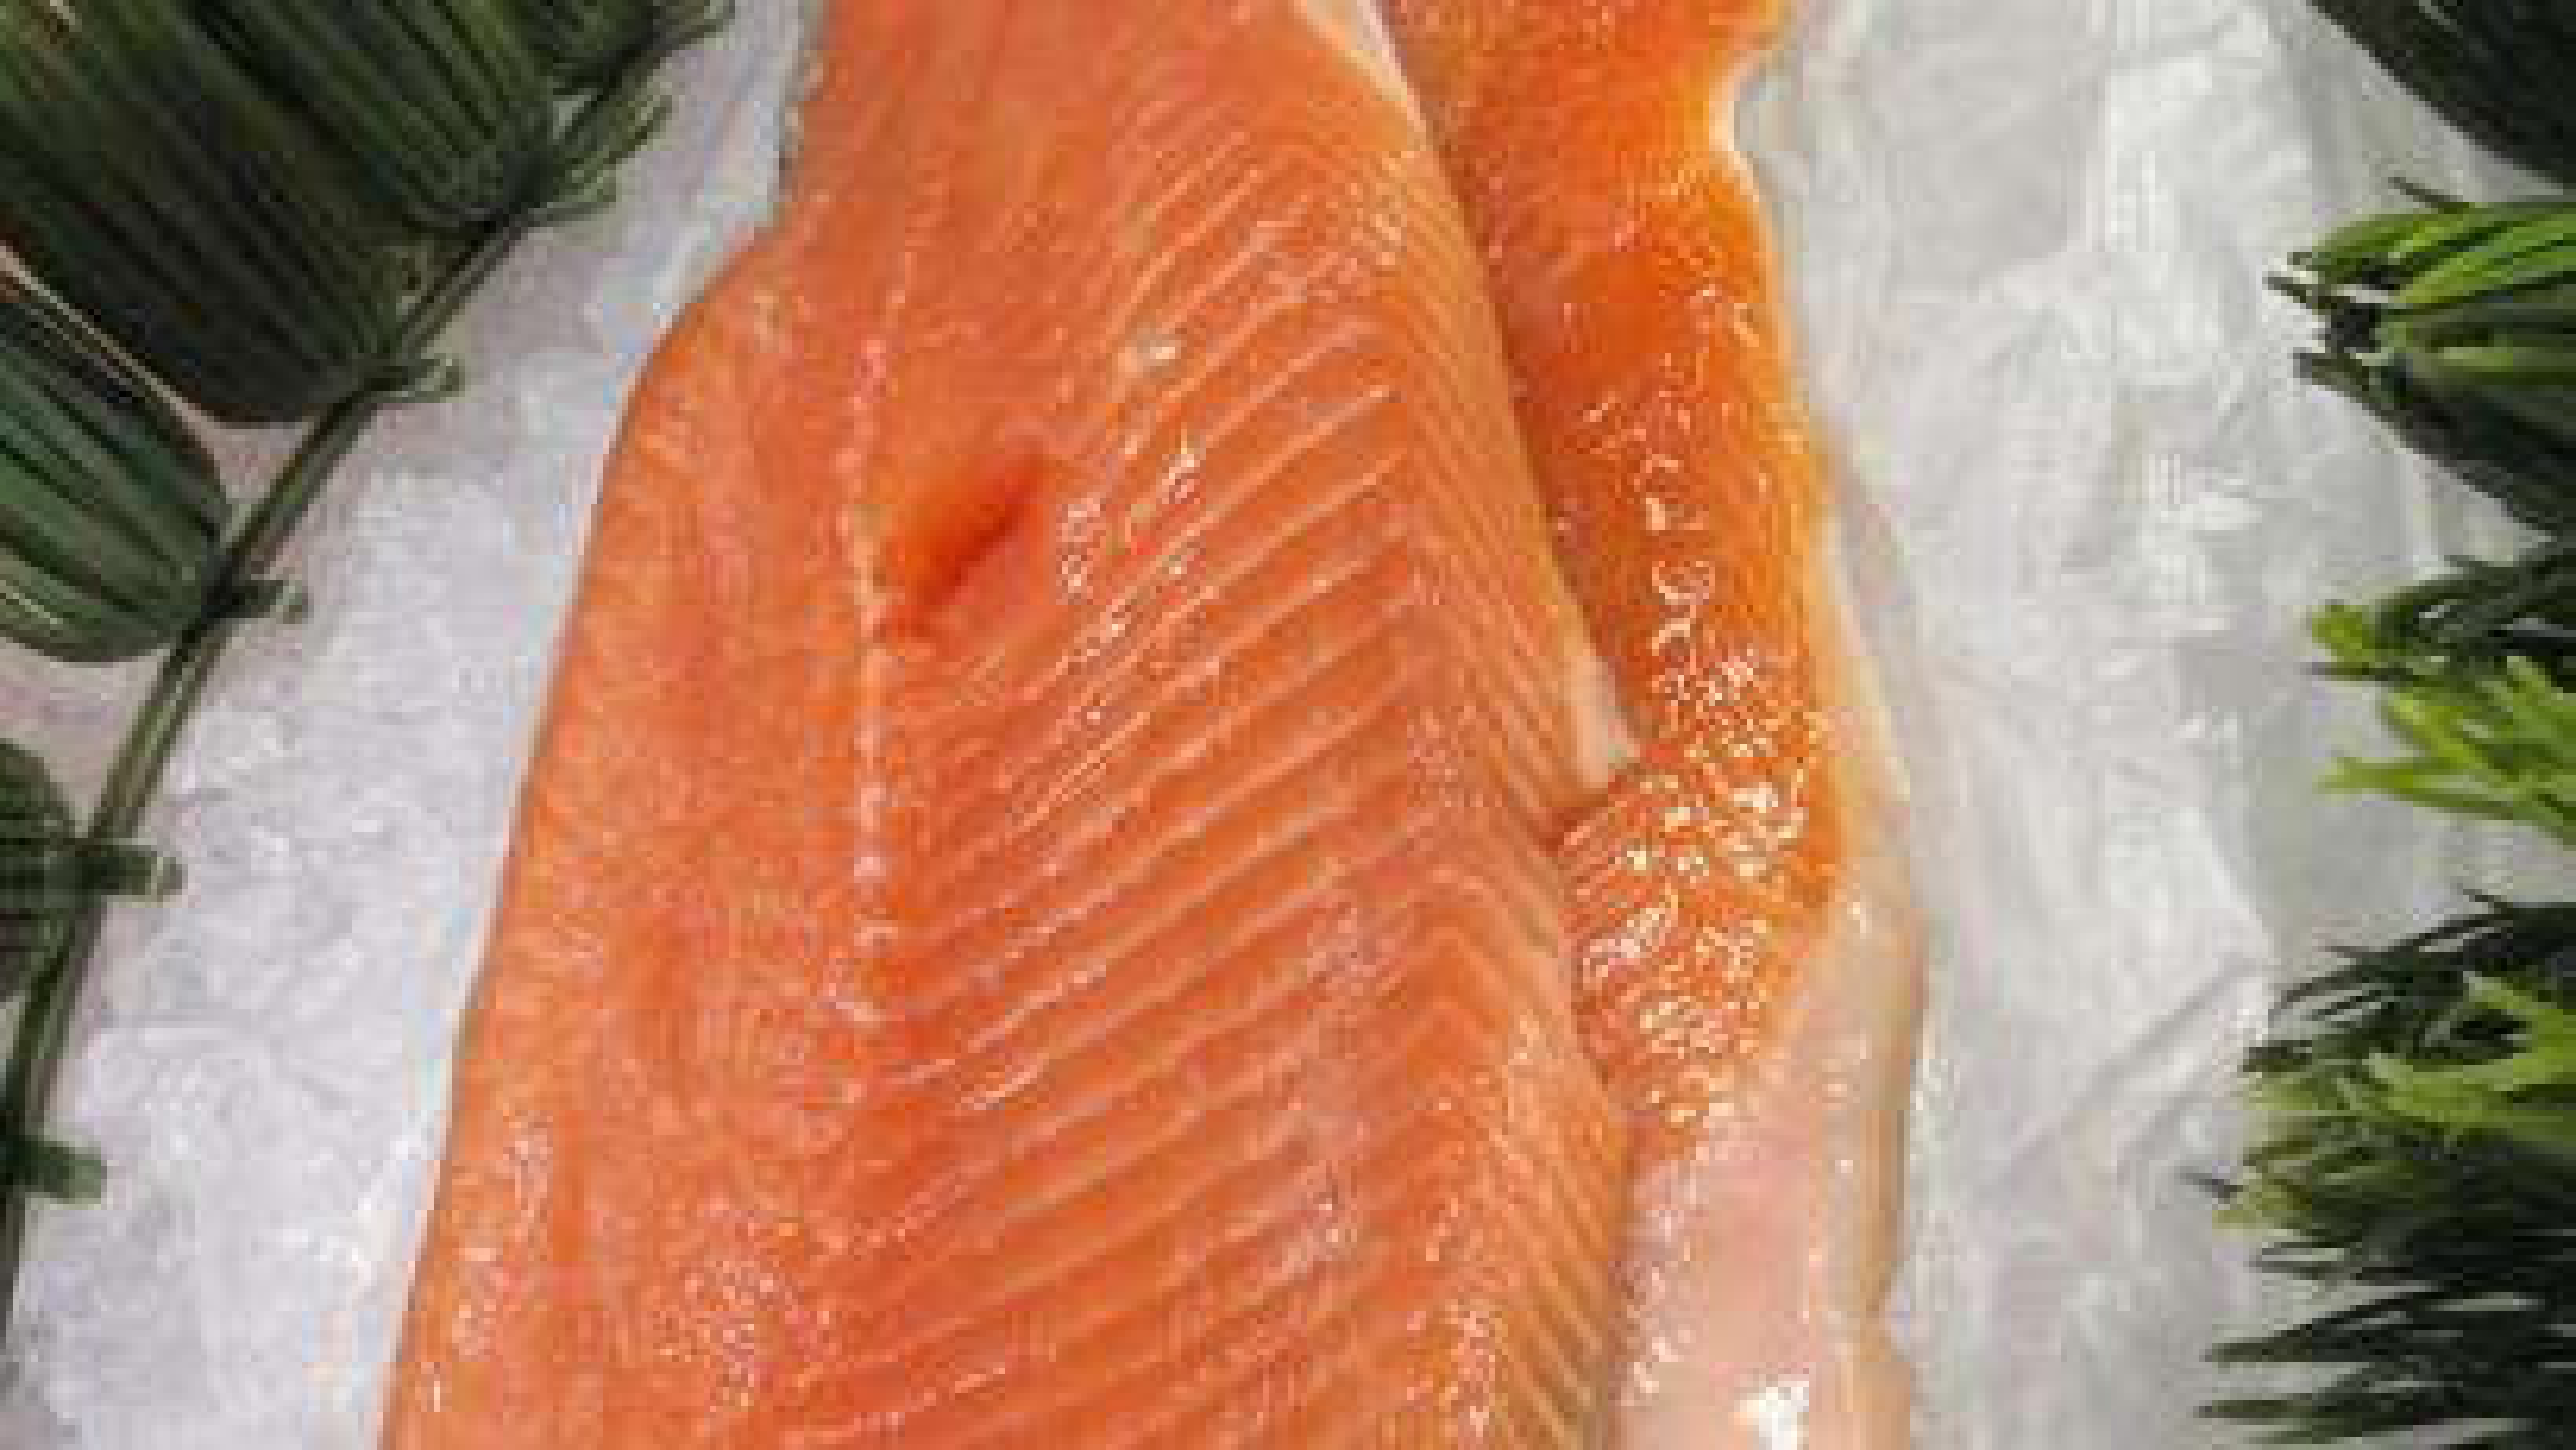 Raw salmon on ice.